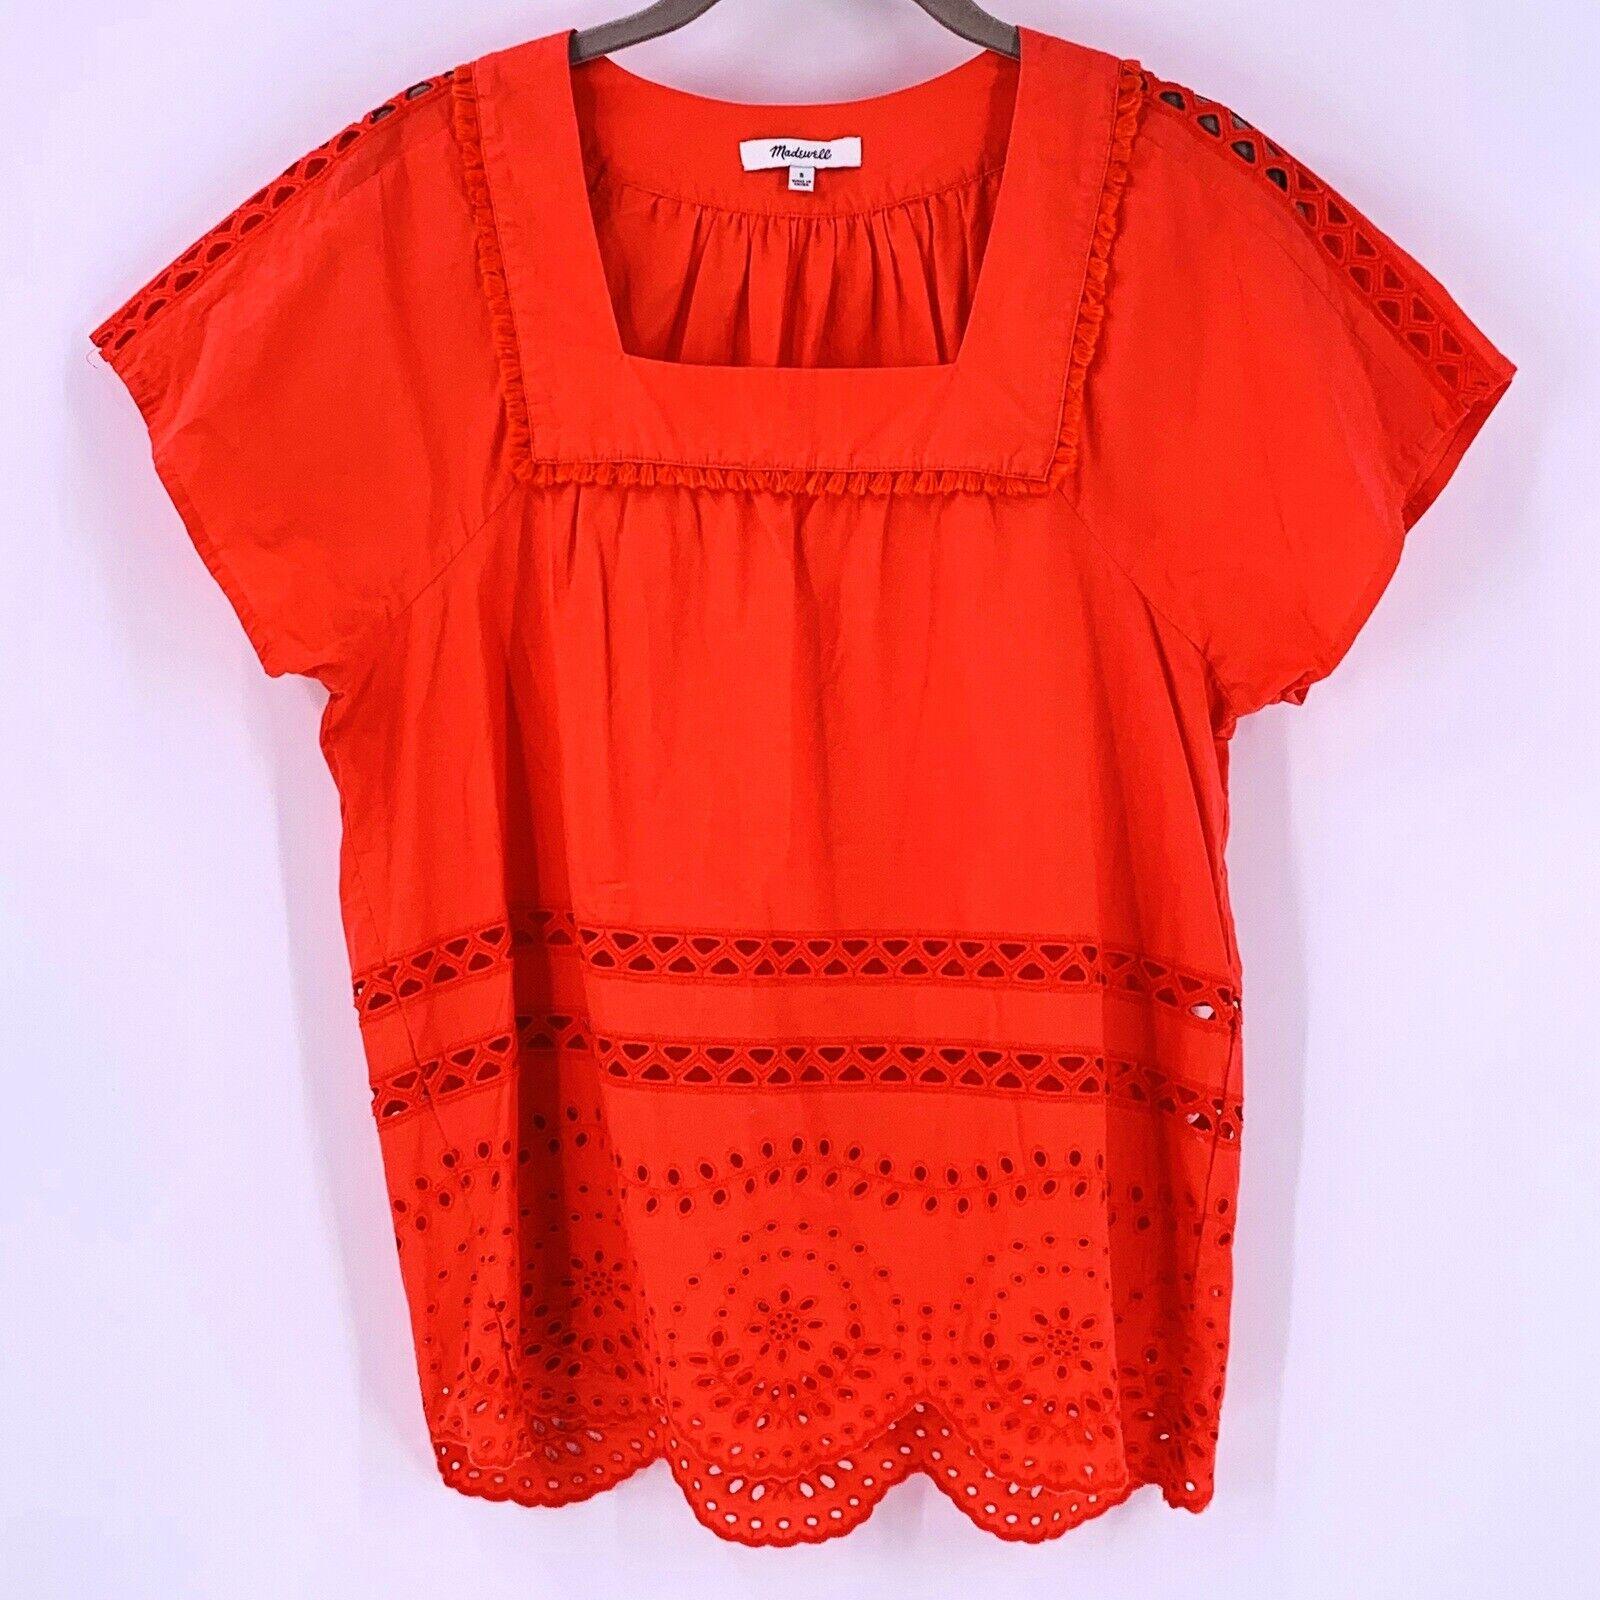 Madewell Orange Cotton Eyelet Angelica Top Size S… - image 4